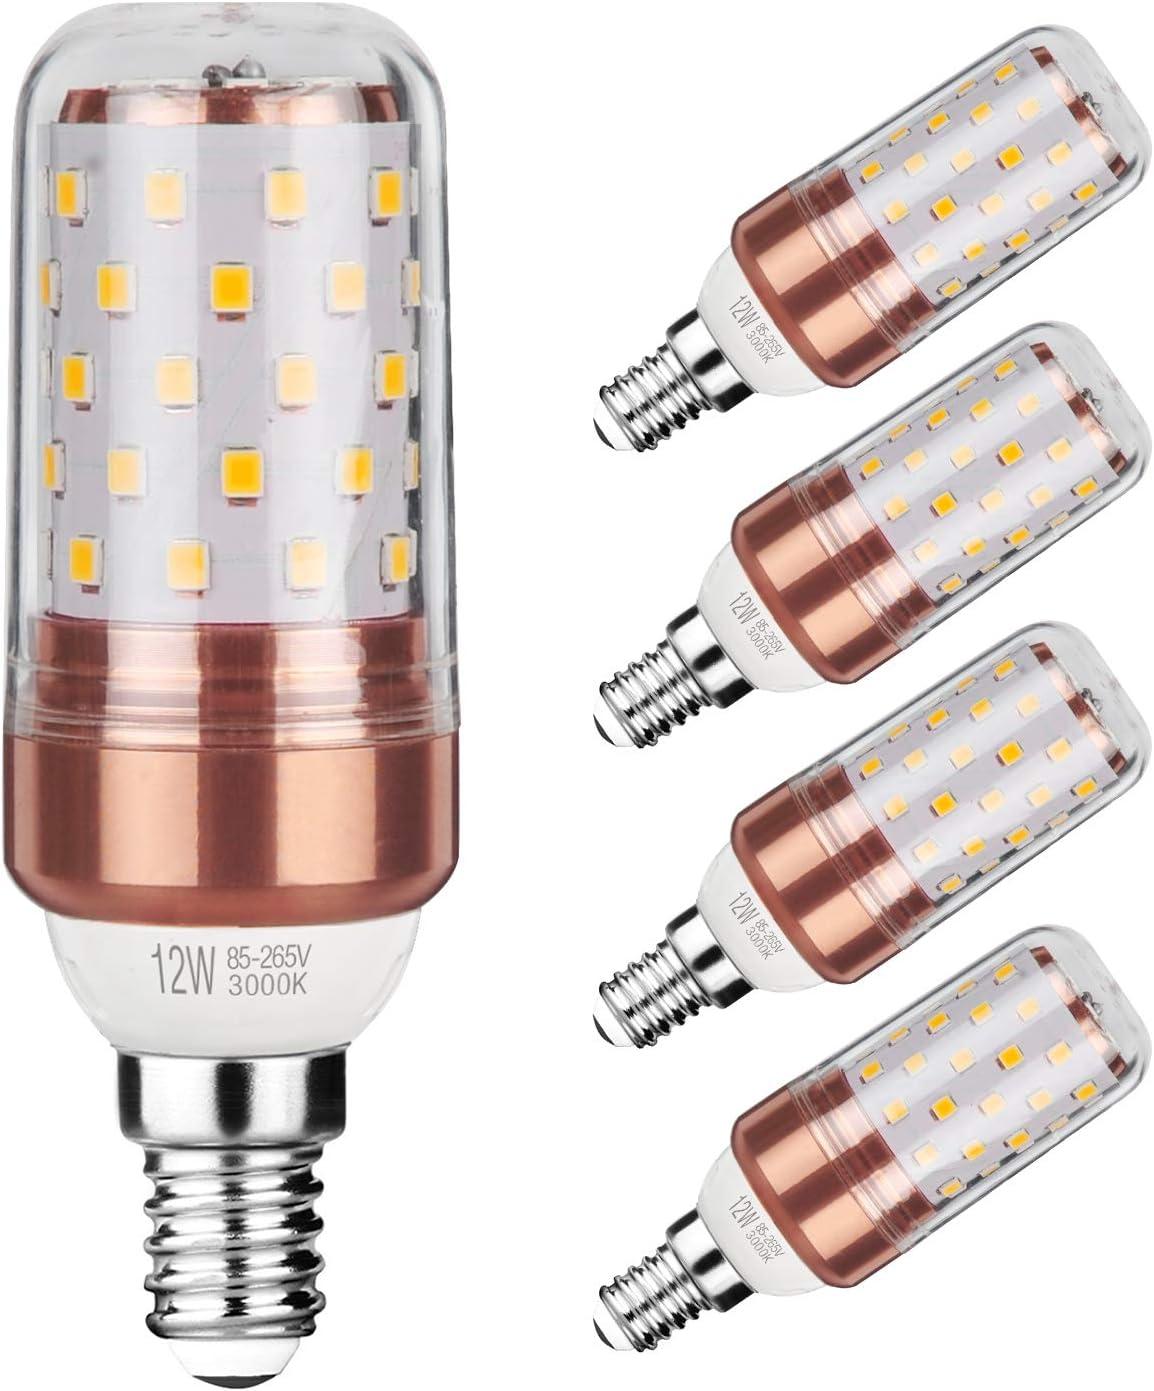 Gezee LED maíz bombilla 12W E14 3000K blanco cálido LED Candelabros bombillas, 100 W bombilla incandescente equivalente, 1200lm, LED vela bombillas No regulables(5 Packs)